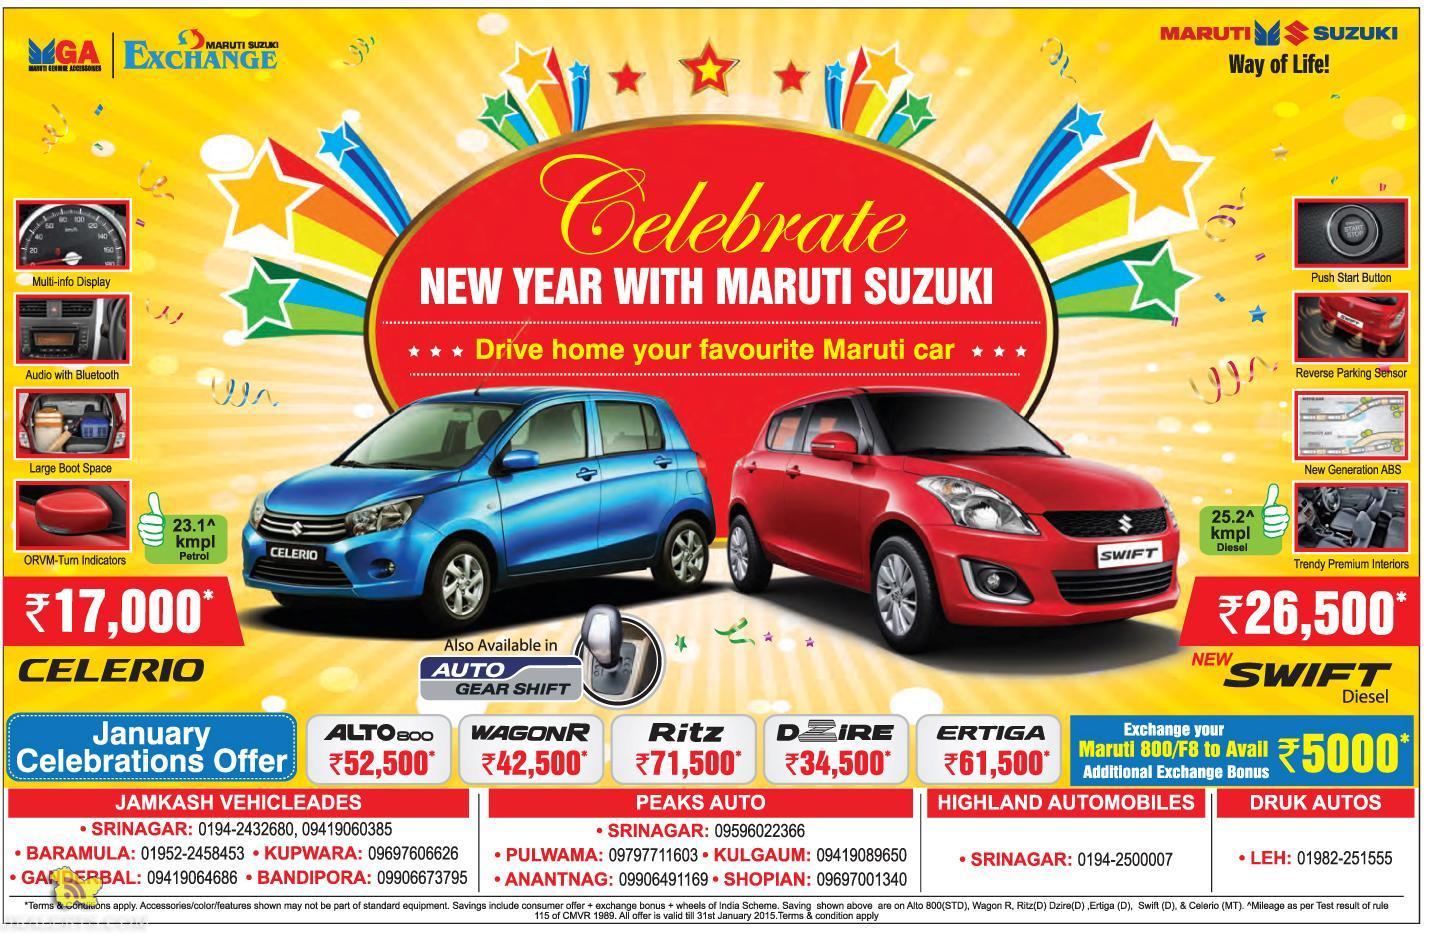 Maruti Suzuki Offer 2015, Celebrate new year with Maruti suzuki